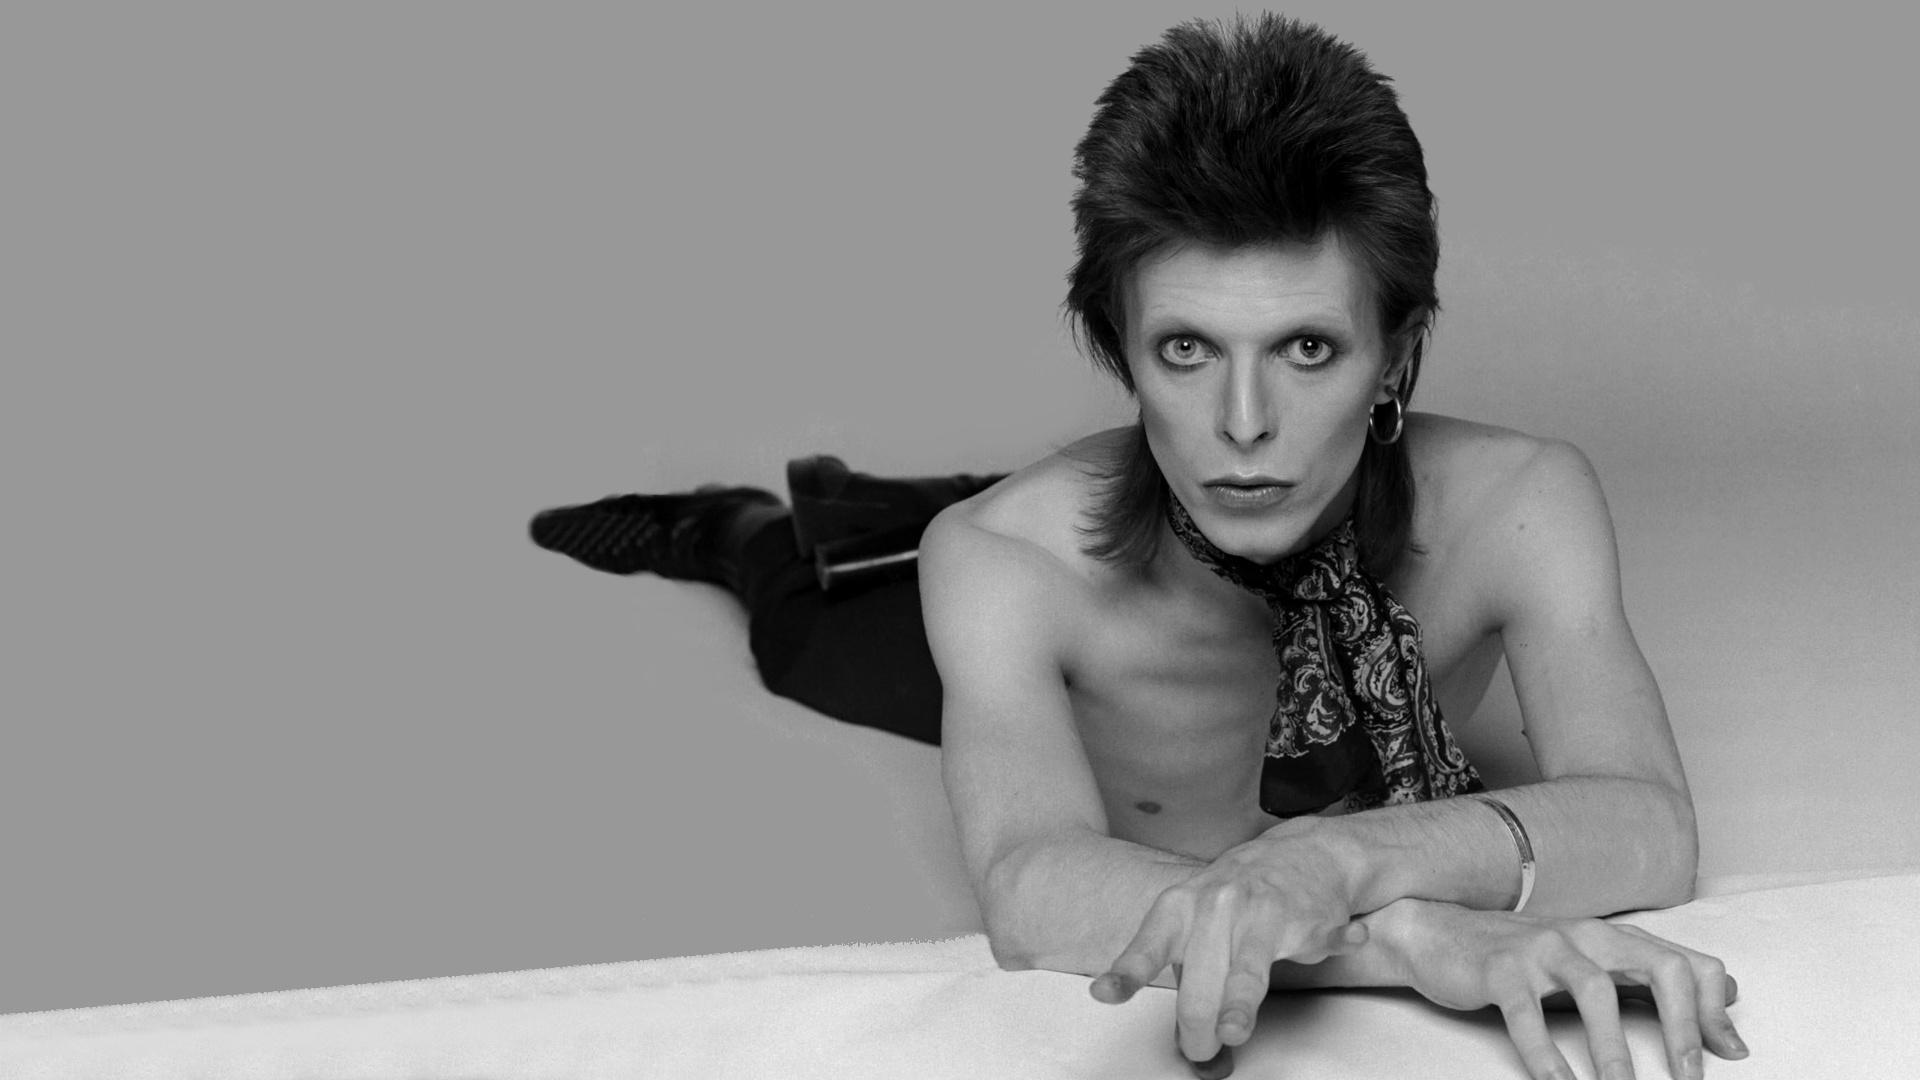 Bowie-david-bowie-34011378-1920-1080